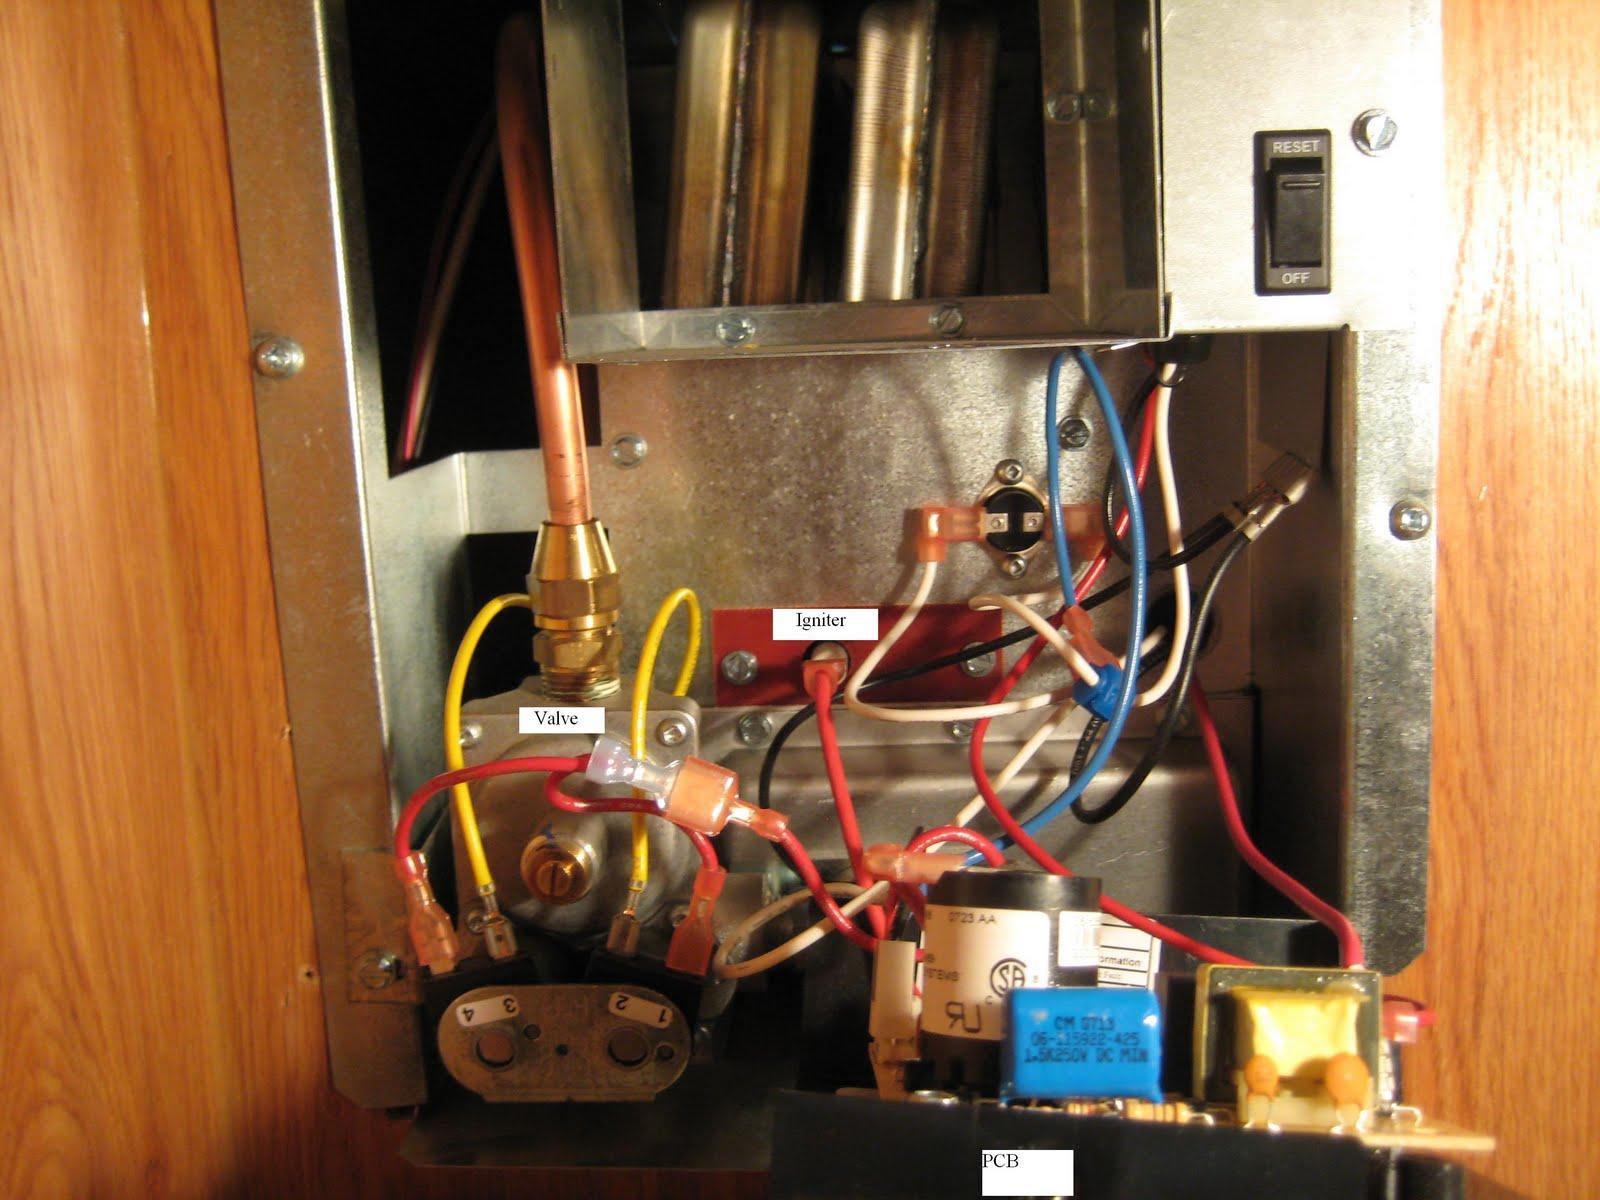 Electric Furnace No Heat Ivoiregion Portable Space Heaters Likewise Fan Limit Switch Circuit Breaker For Jayco Pop Up Wiring Diagram